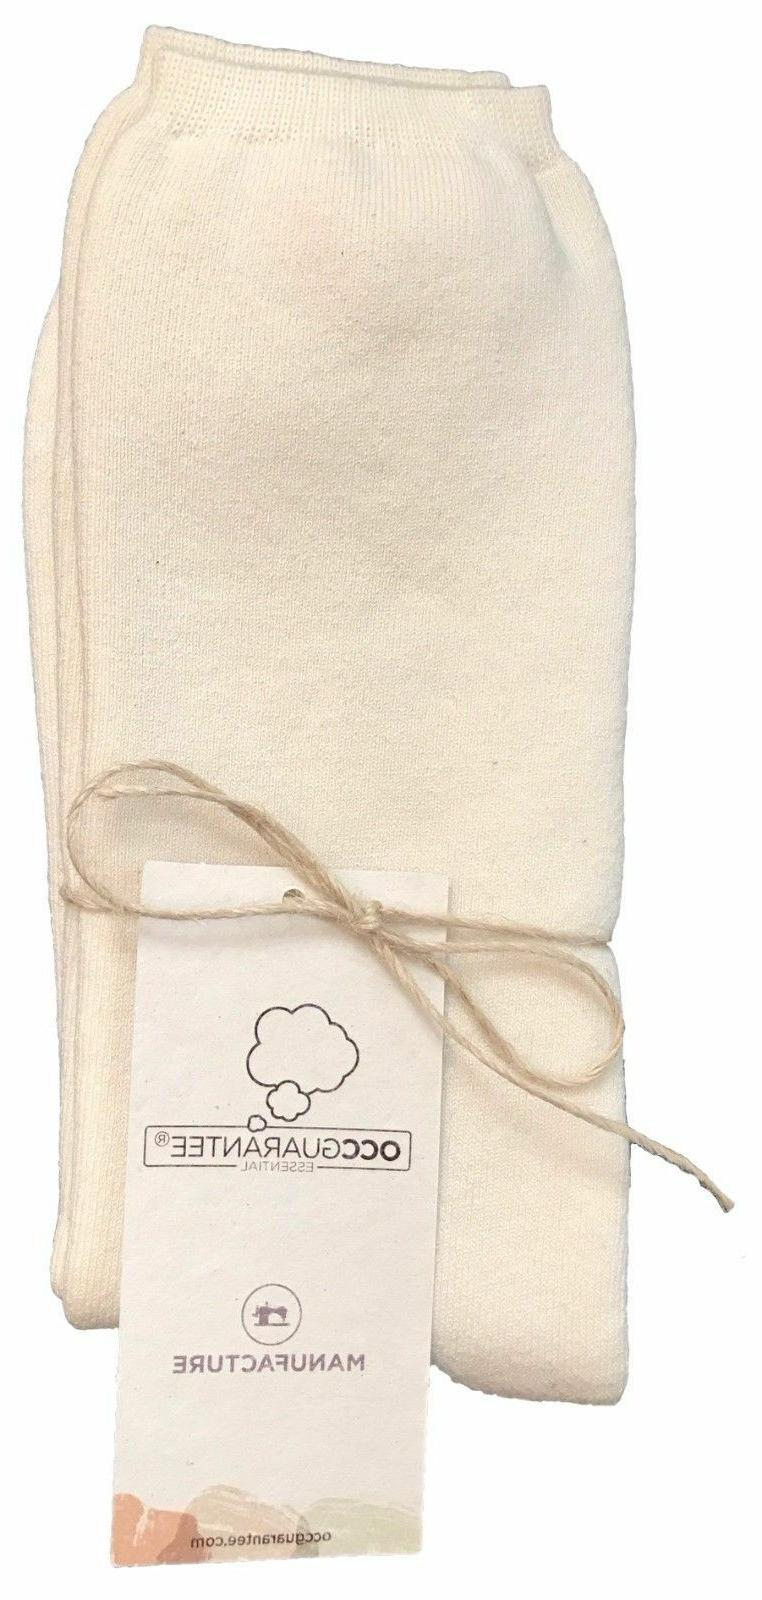 100 percent organic natural cotton socks mens